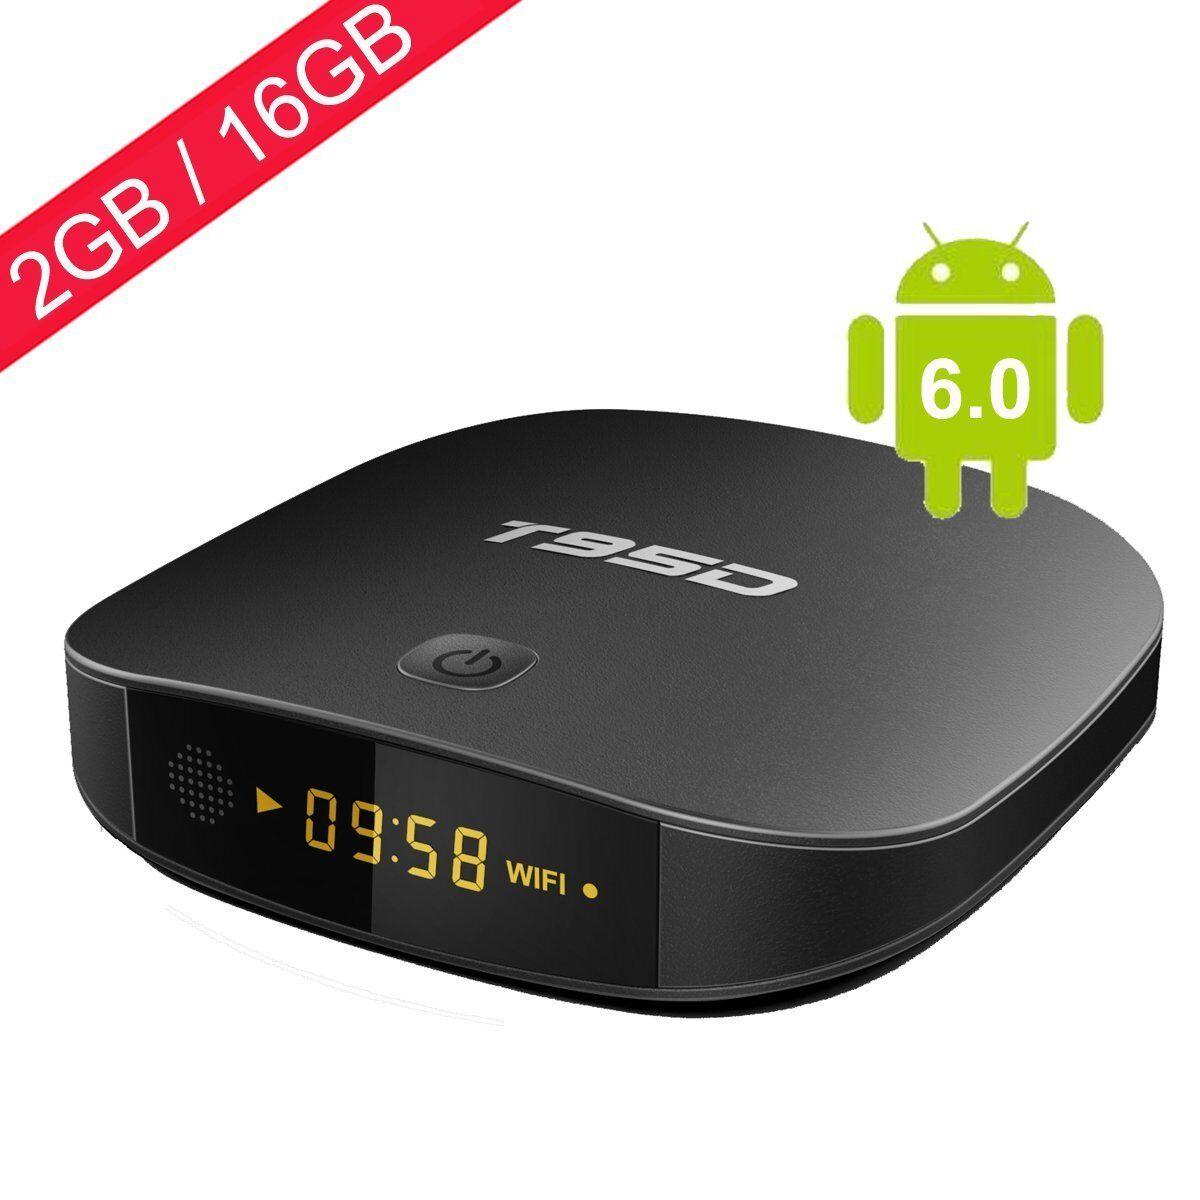 Android 6.0 TV Box 2GB RAM 16GB ROM Quad Core Supporting 4K – HD W/ WiFi LAN